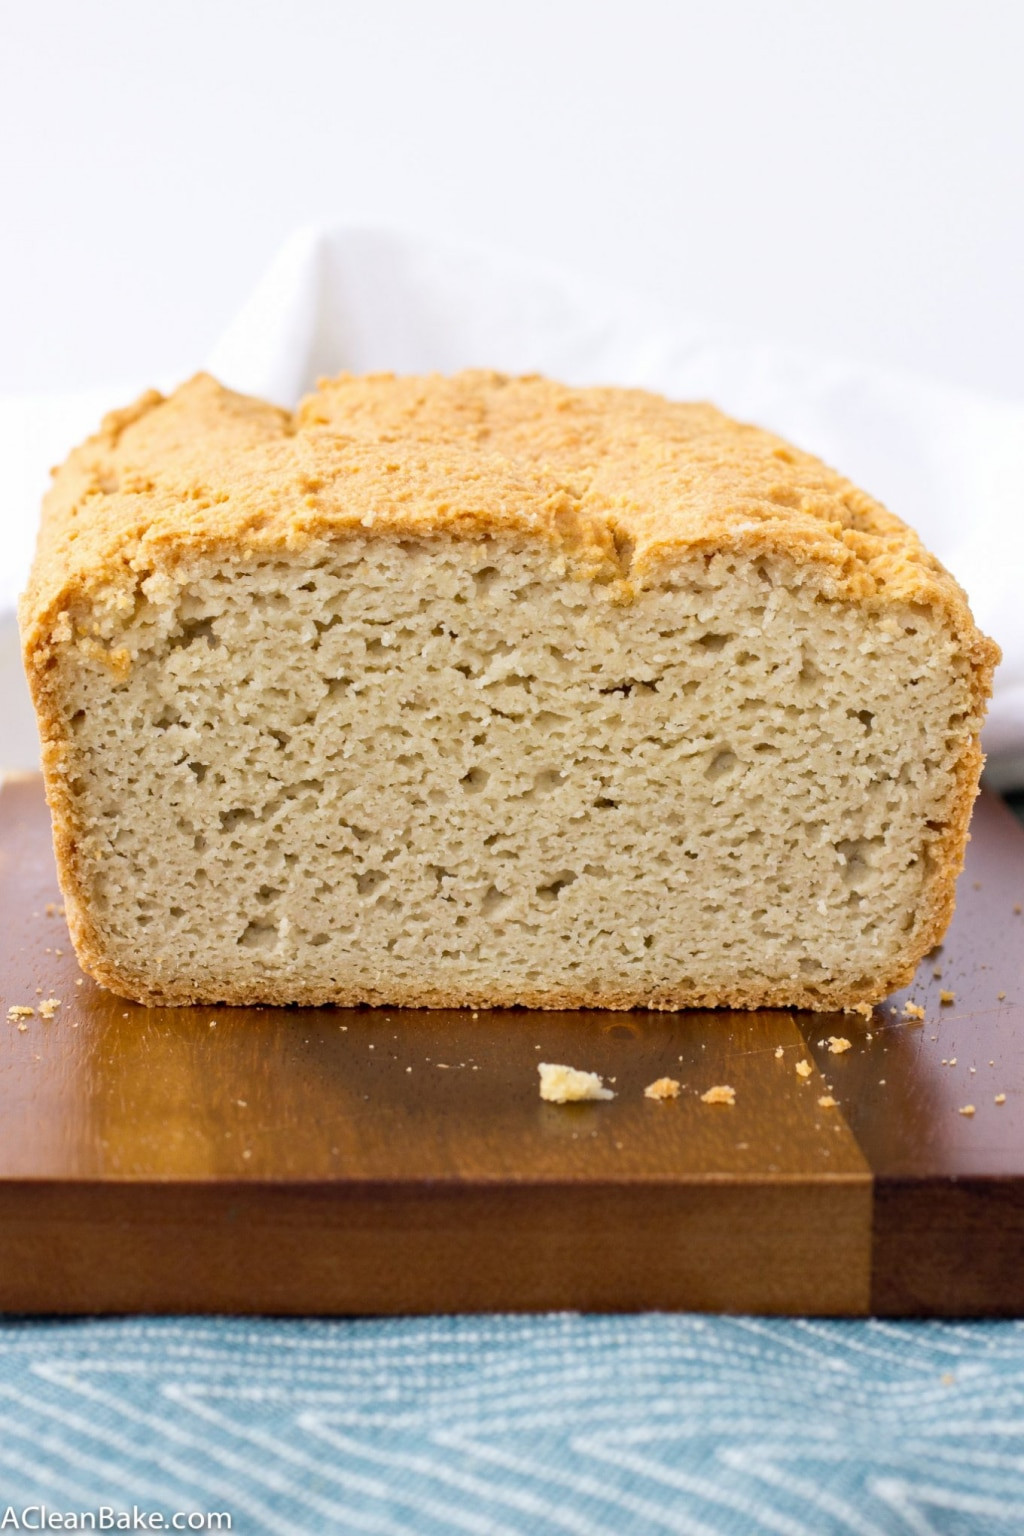 Gluten Free Bread No Yeast  Grain Free Sandwich Bread Gluten Free Yeast Free and